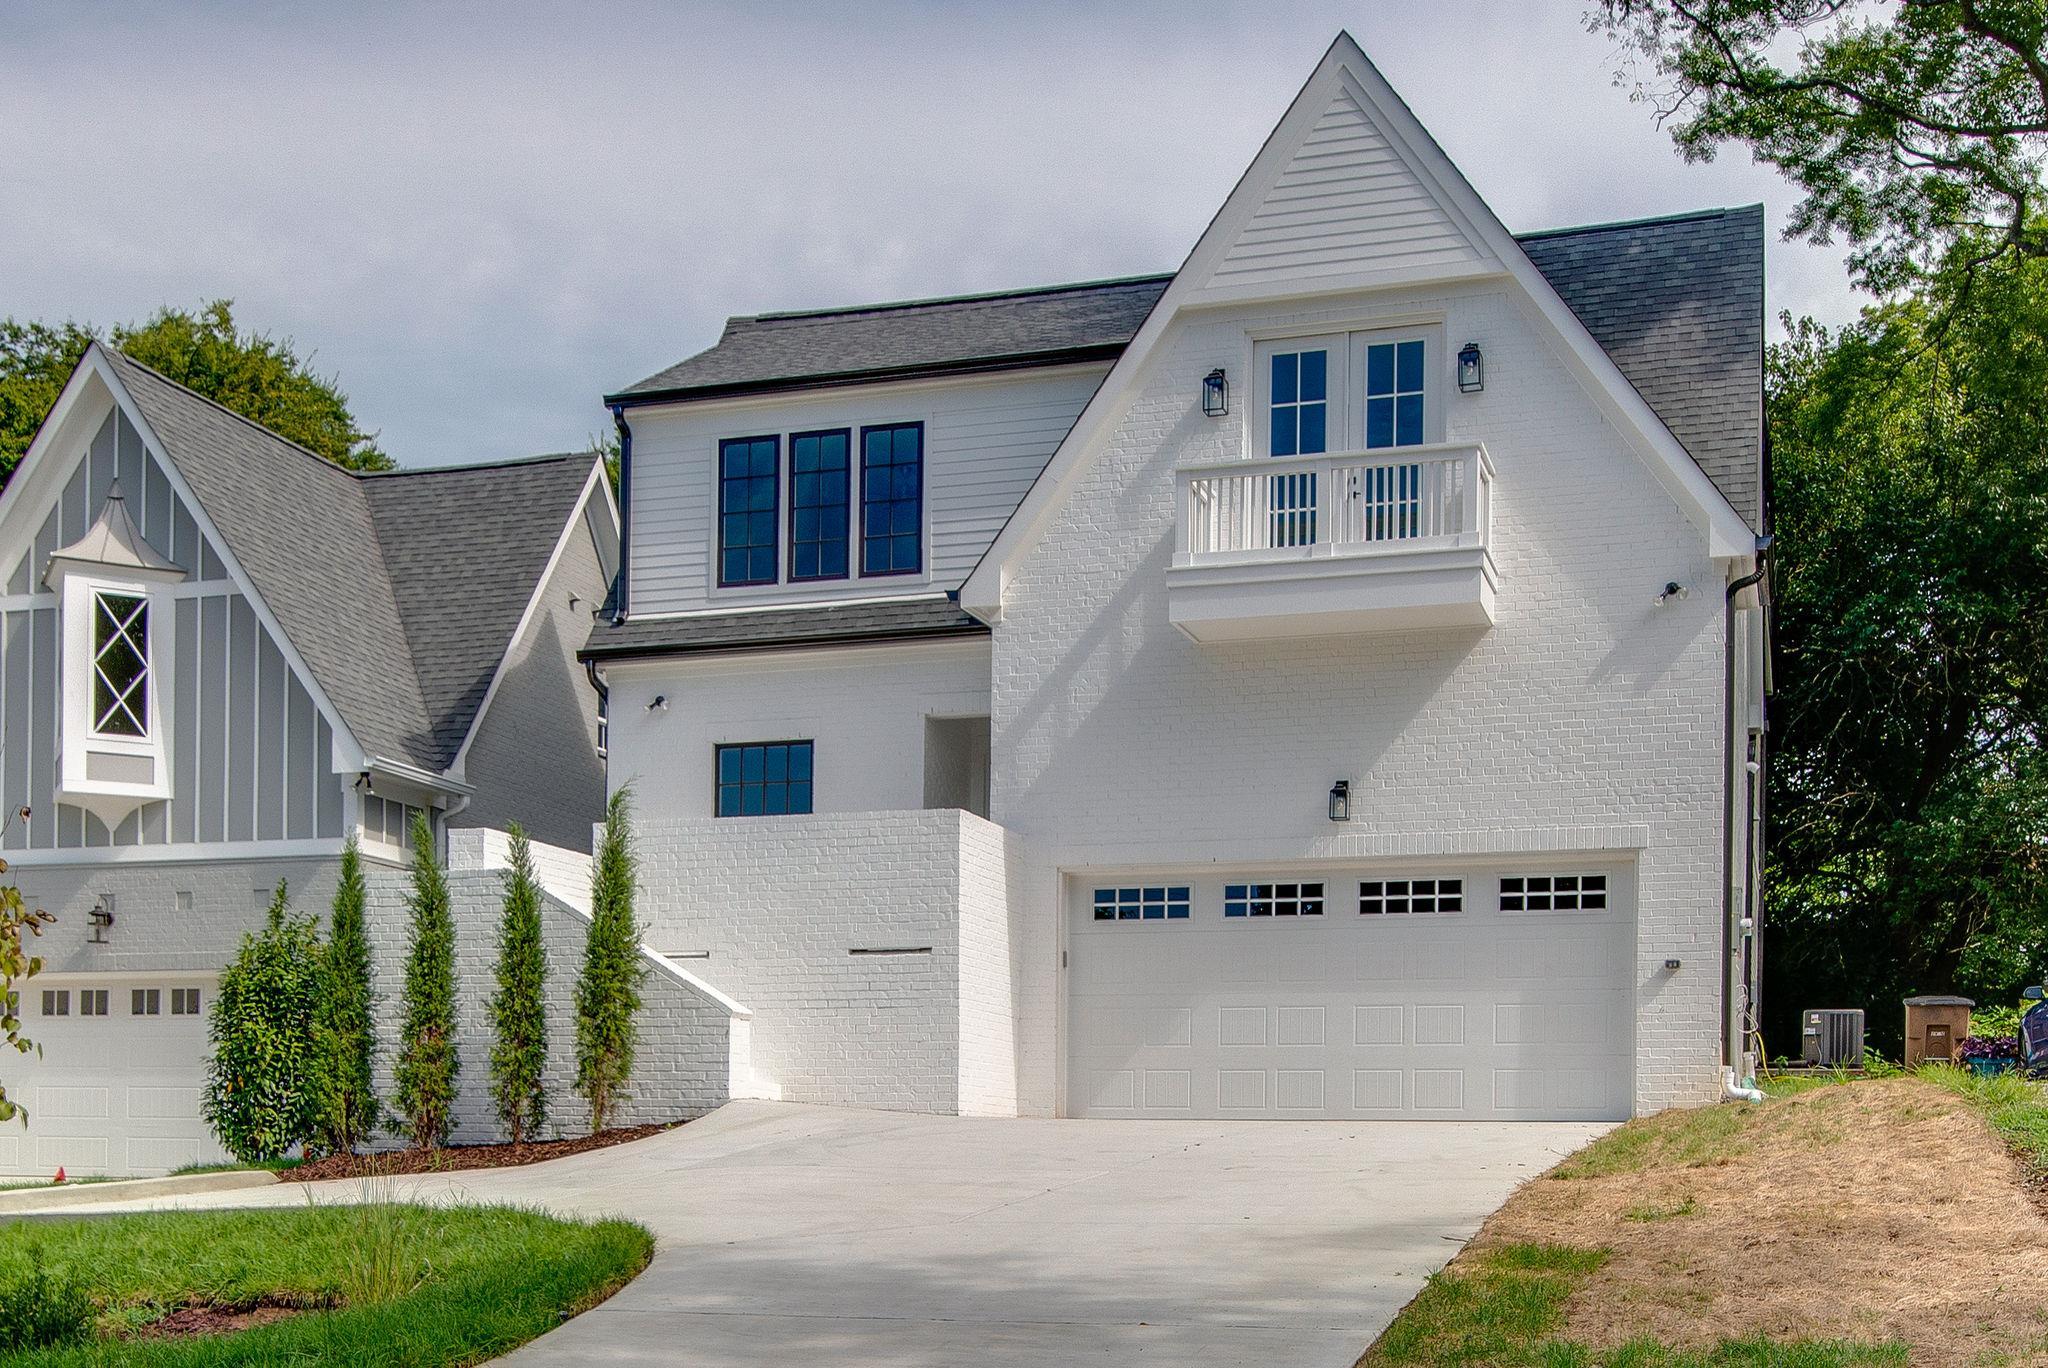 846 Sutton Hill Rd, Nashville, TN 37204 - Nashville, TN real estate listing